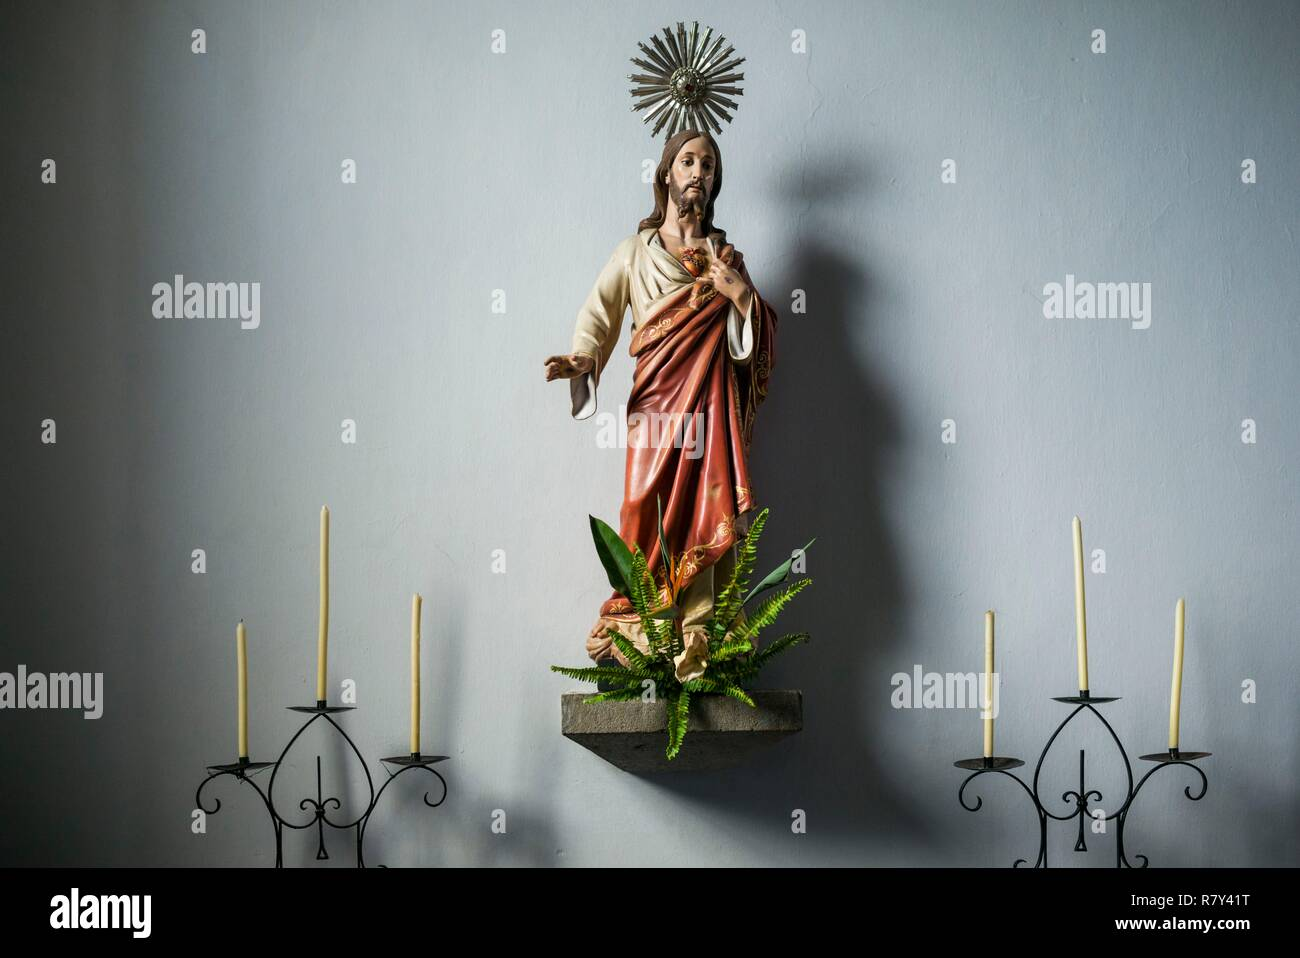 Portugal, Azores, Terceira Island, Sao Sebastiao, 15th century town church, statue of Jesus Christ - Stock Image